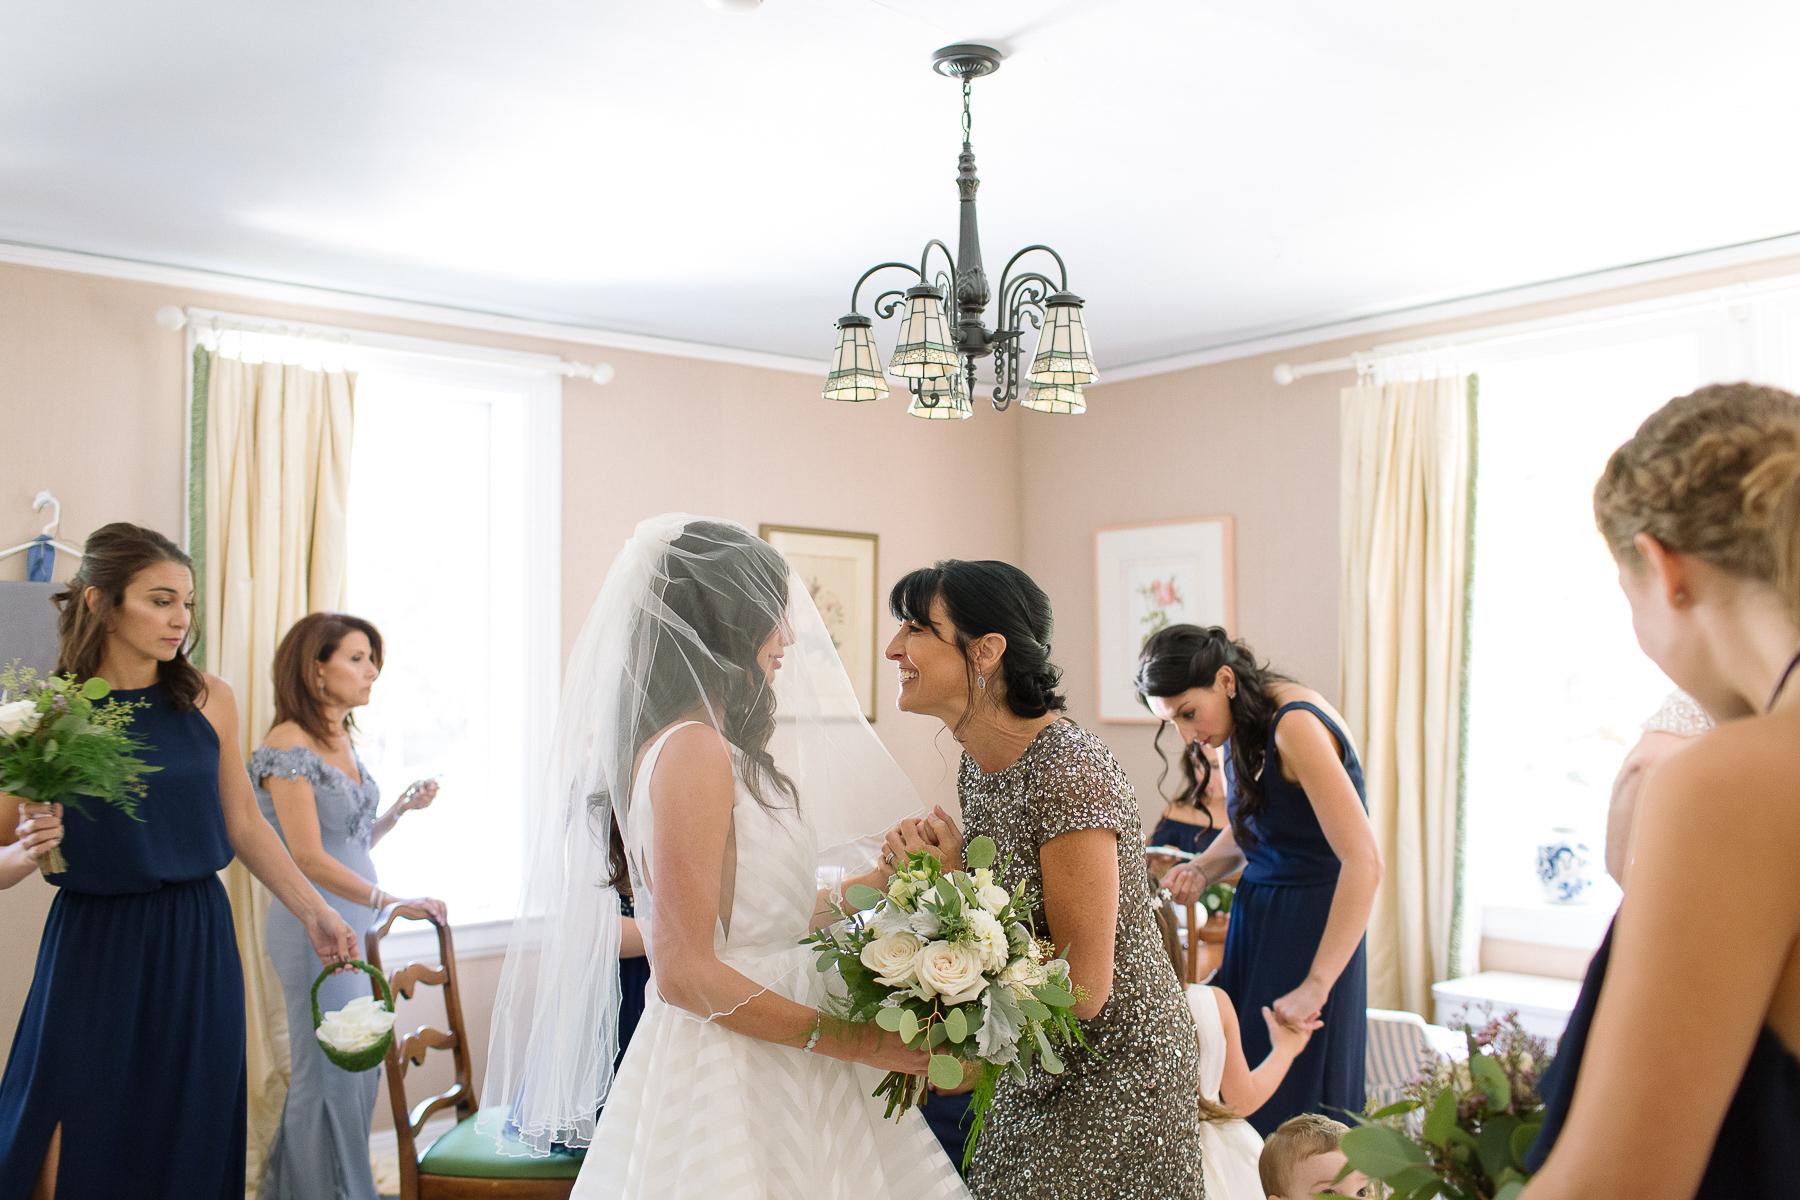 long island wedding photographer candid non-cheesy